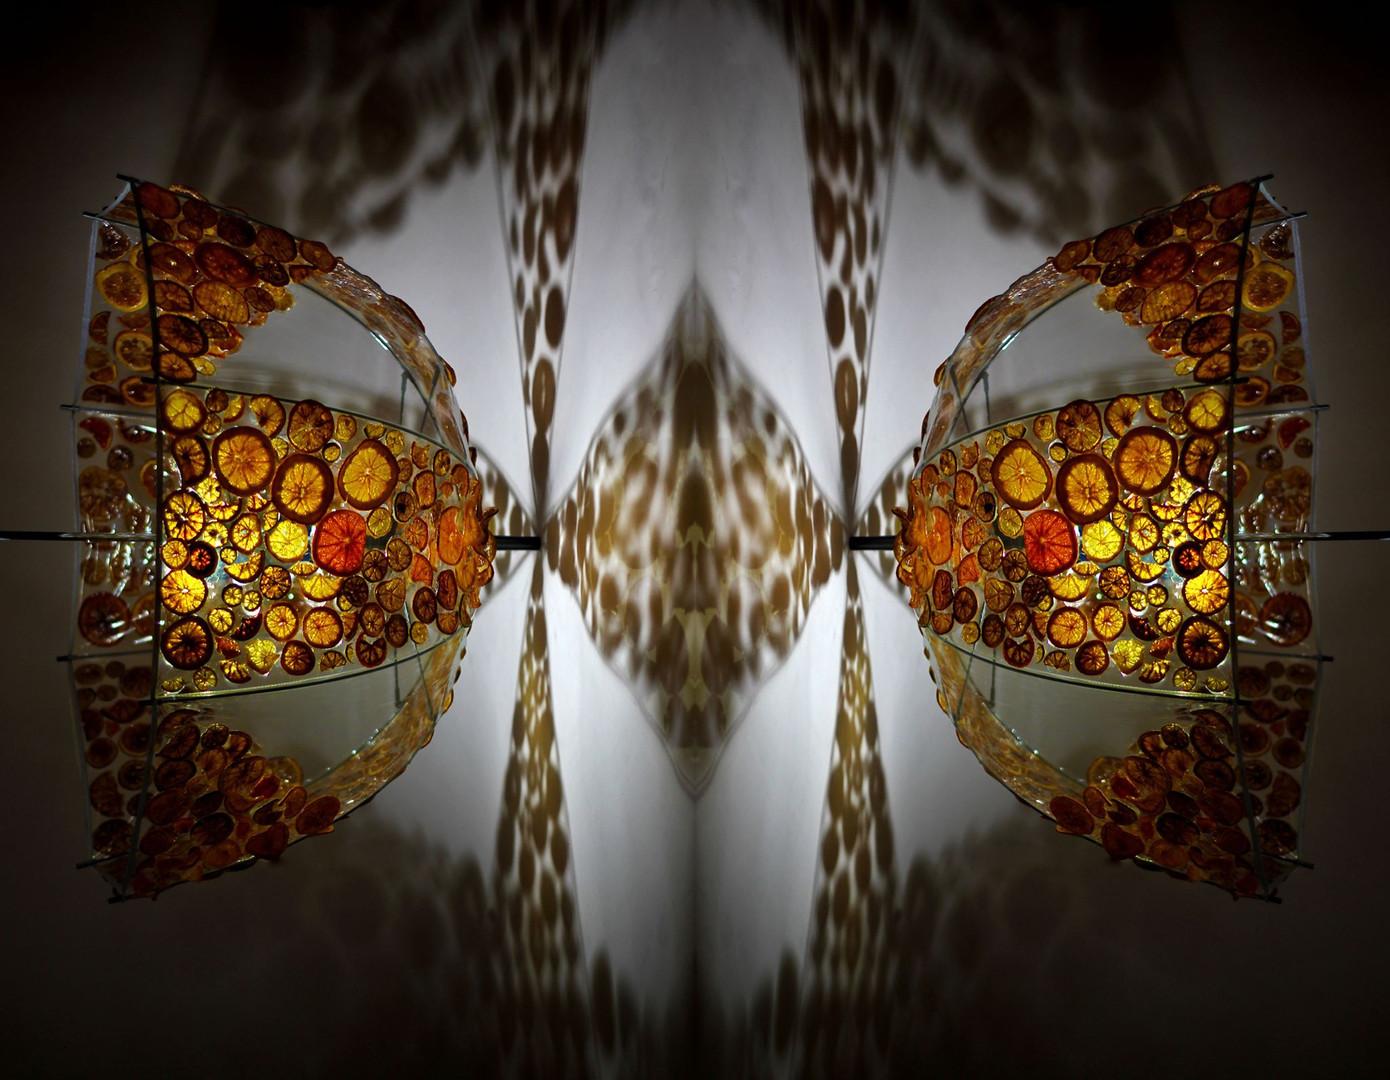 Citrus by Talia Umbrella